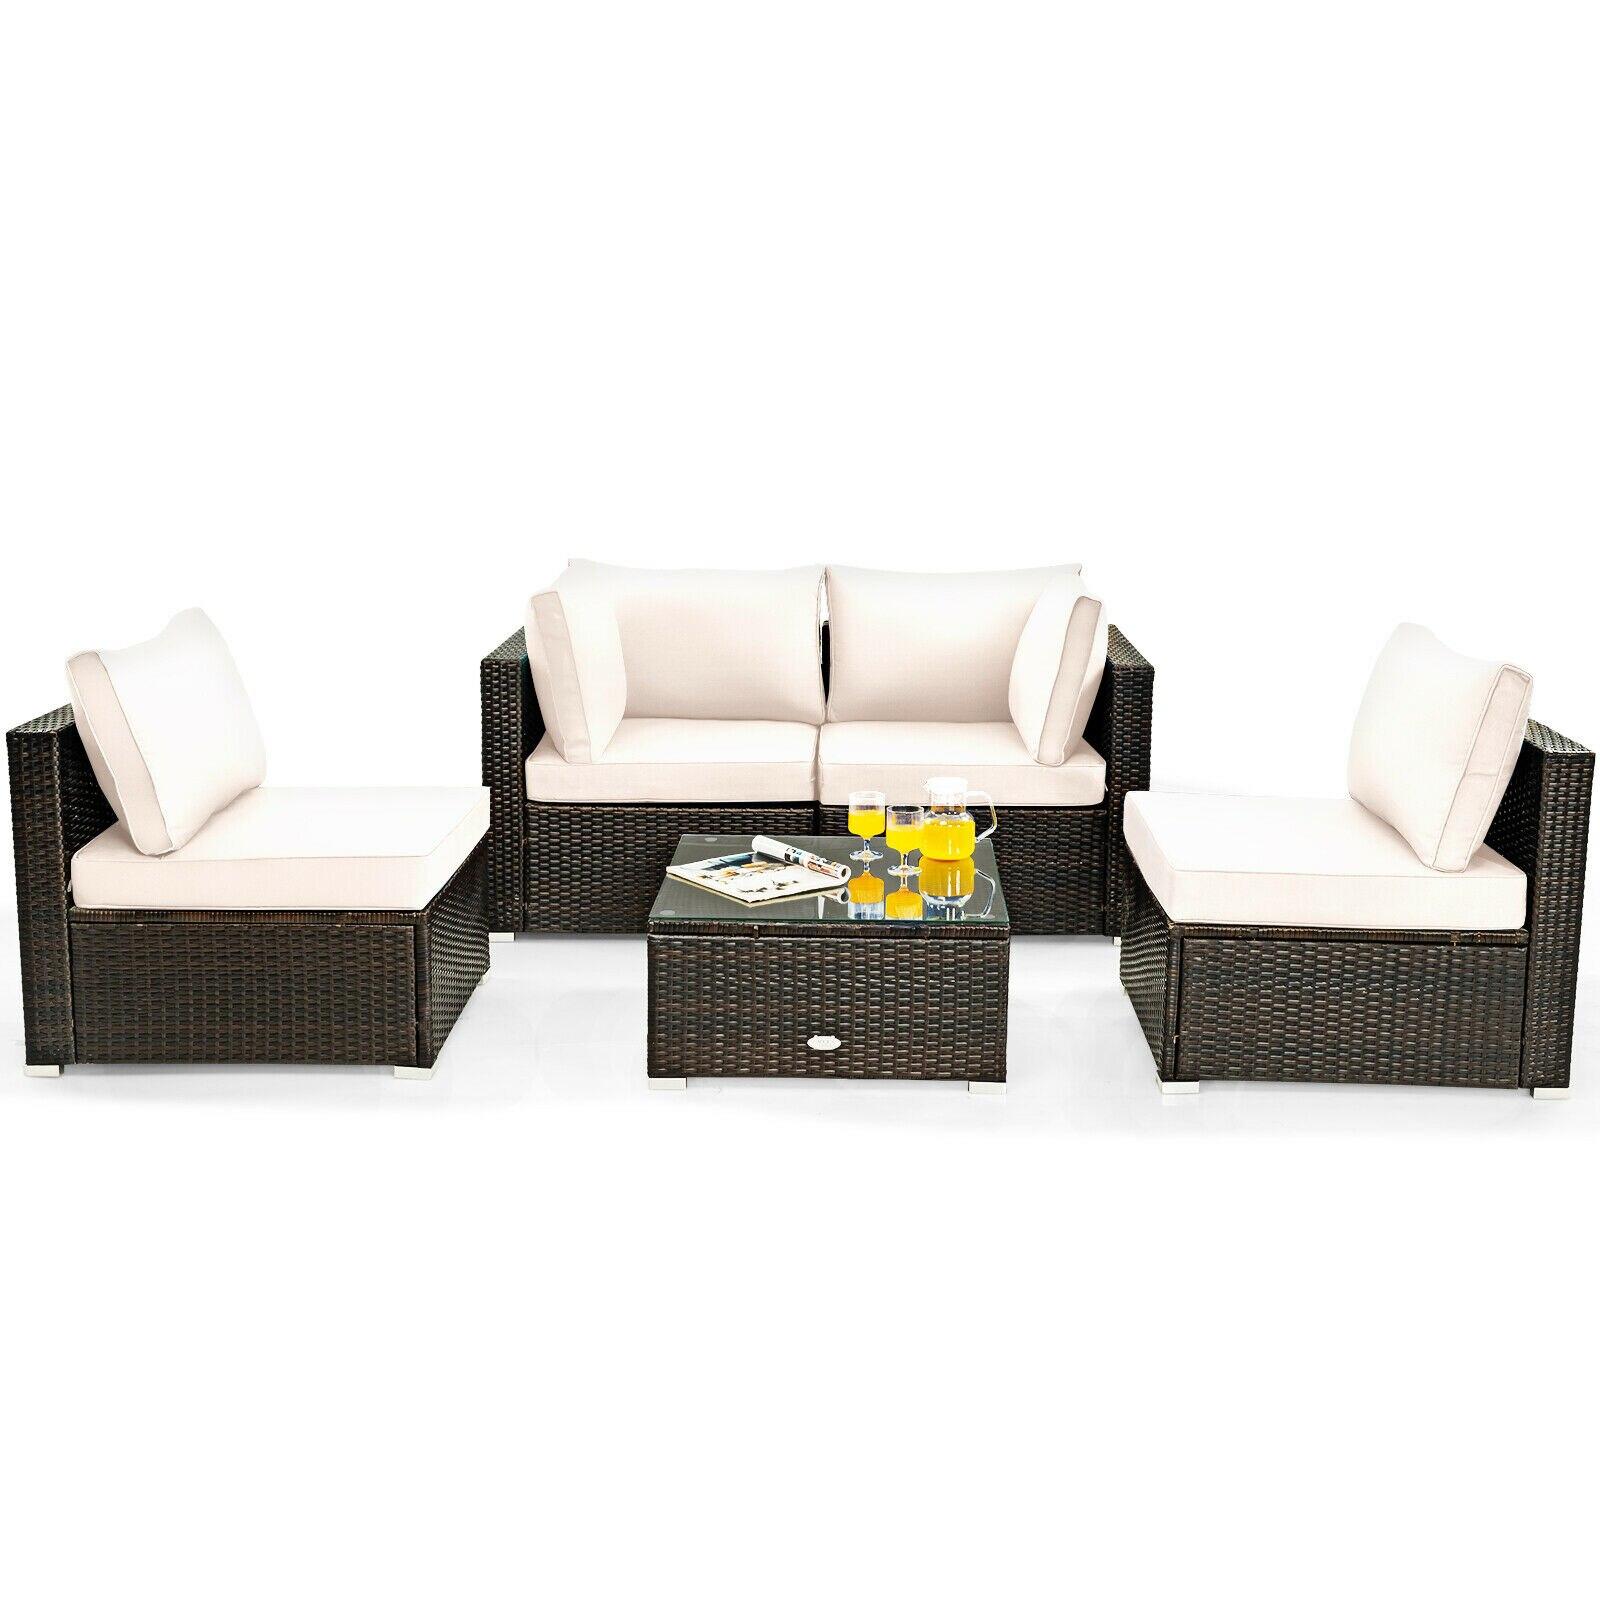 5PCS Patio Rattan Furniture Set Cushioned Sofa Chair Coffee Table HW67243